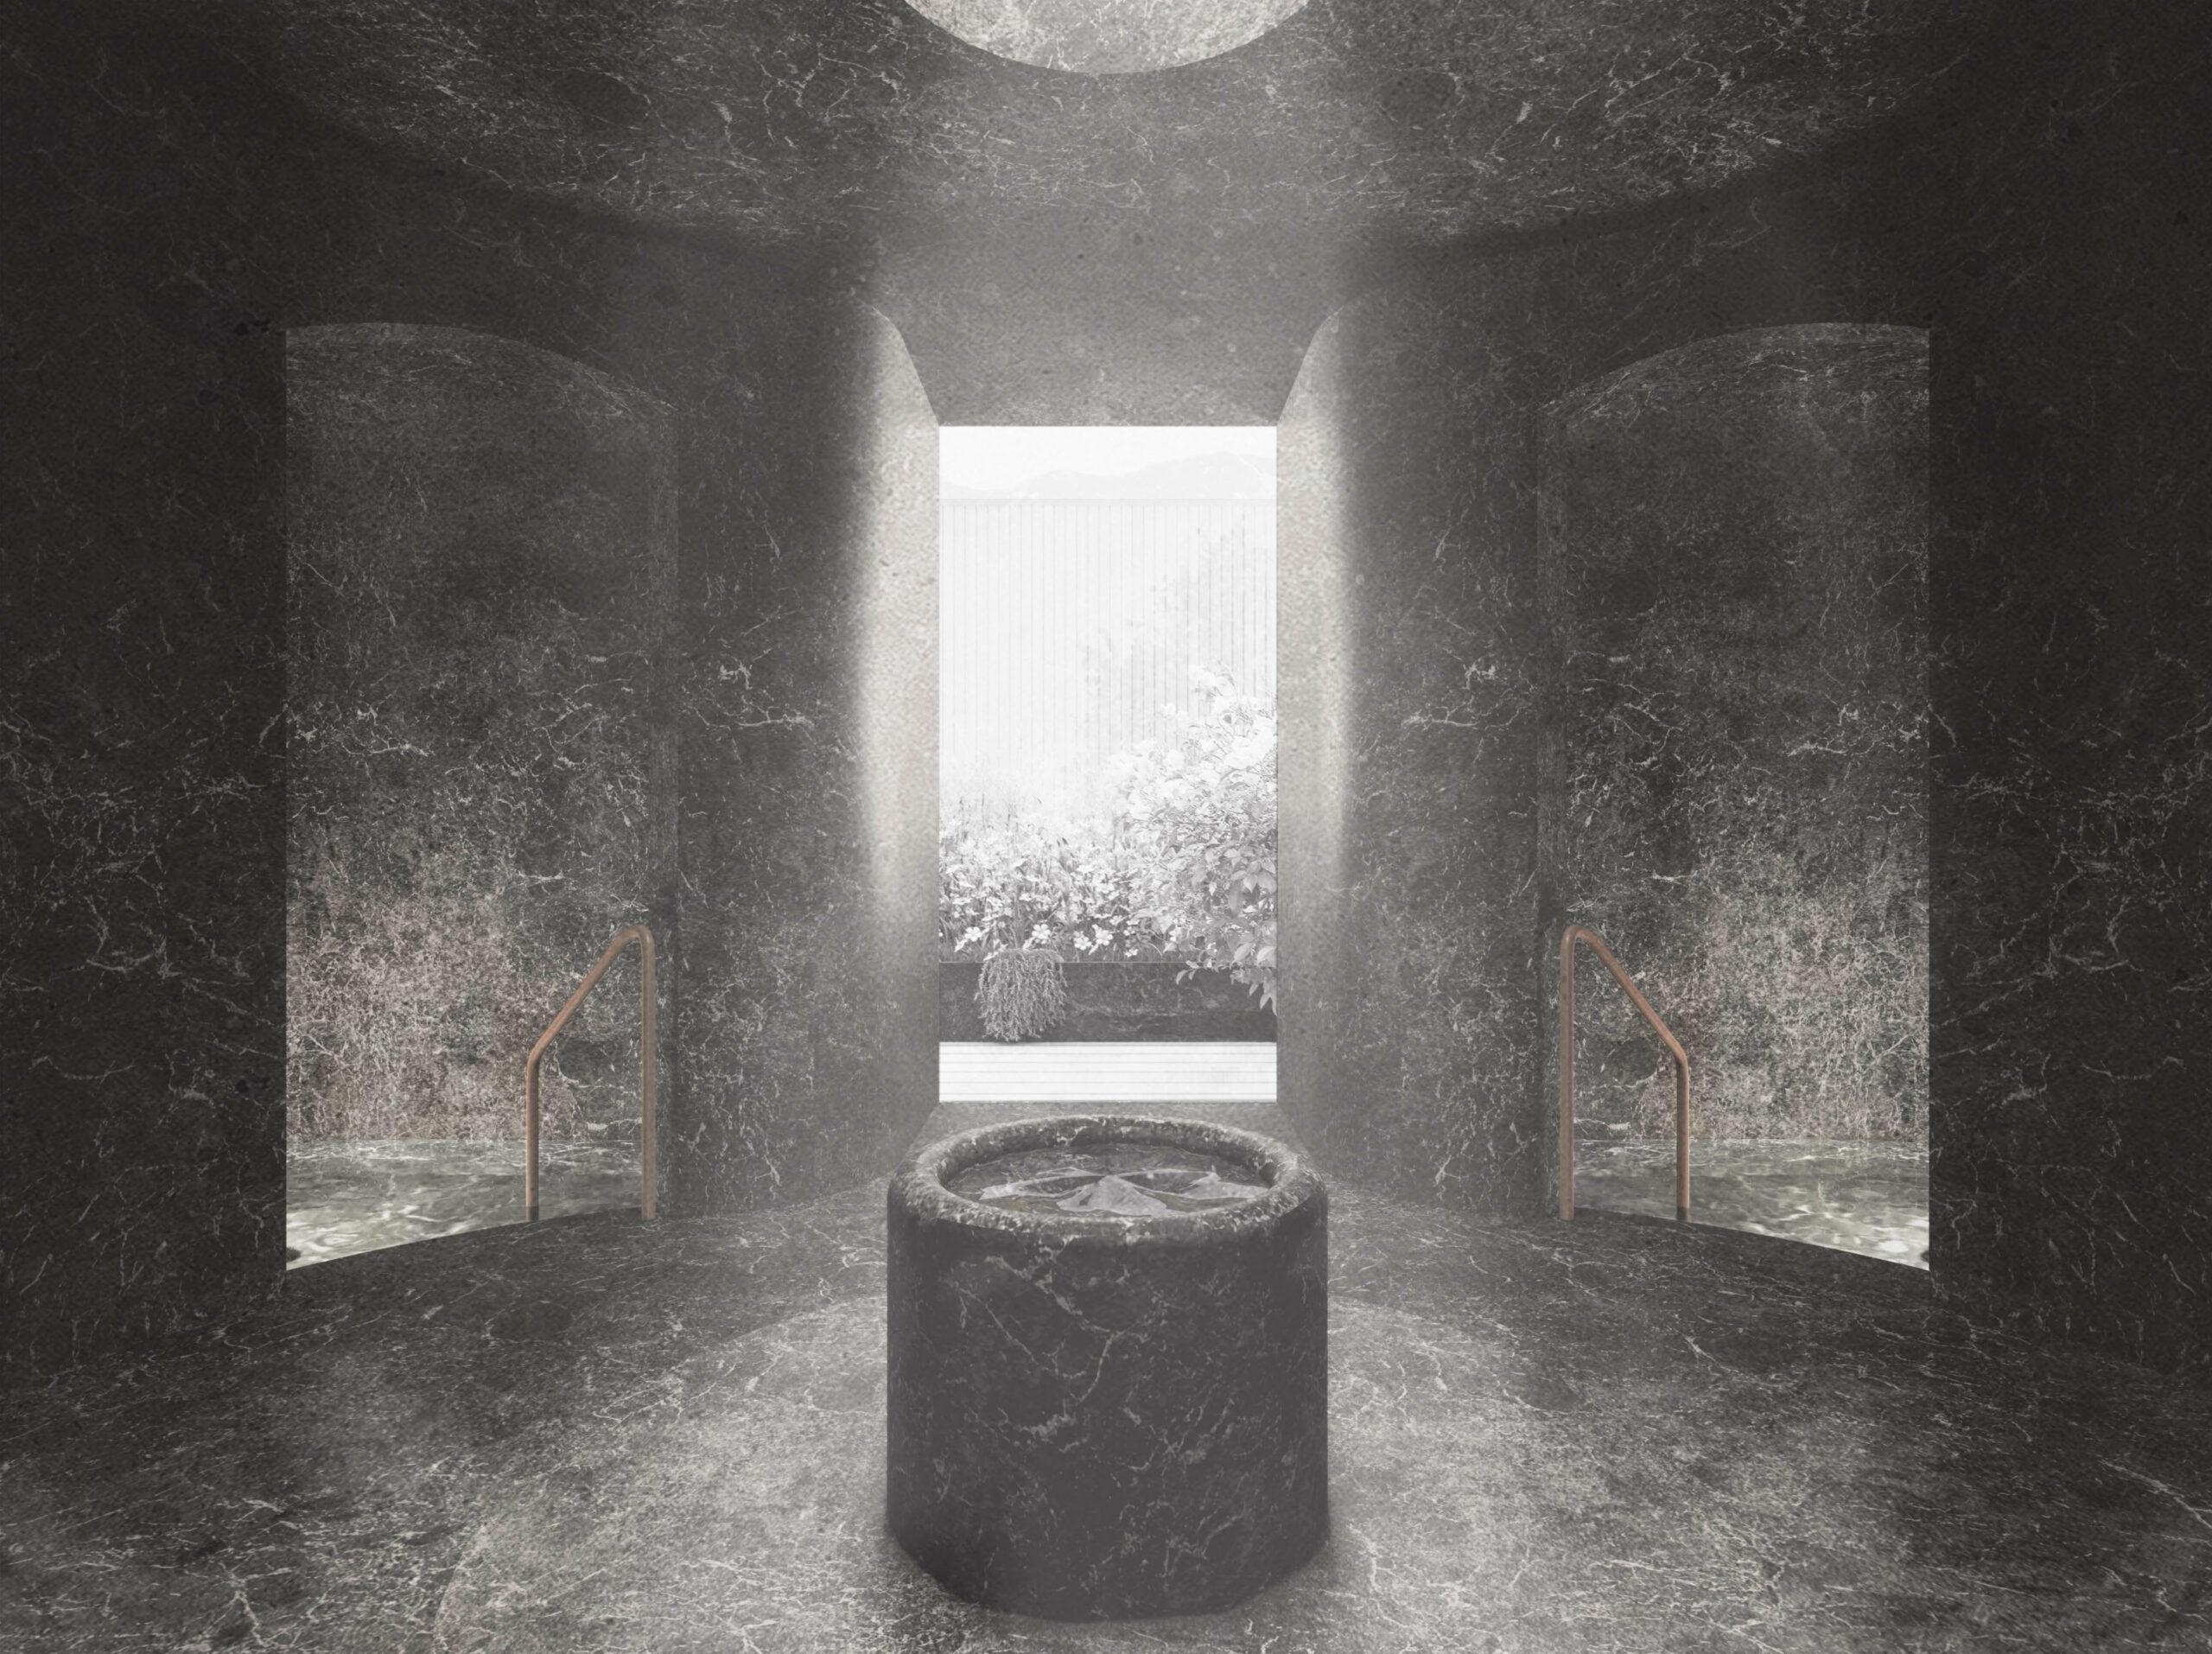 Michael-Becker-Architects-Architekten-Therme-Oberstdorf-V-Sauna-1